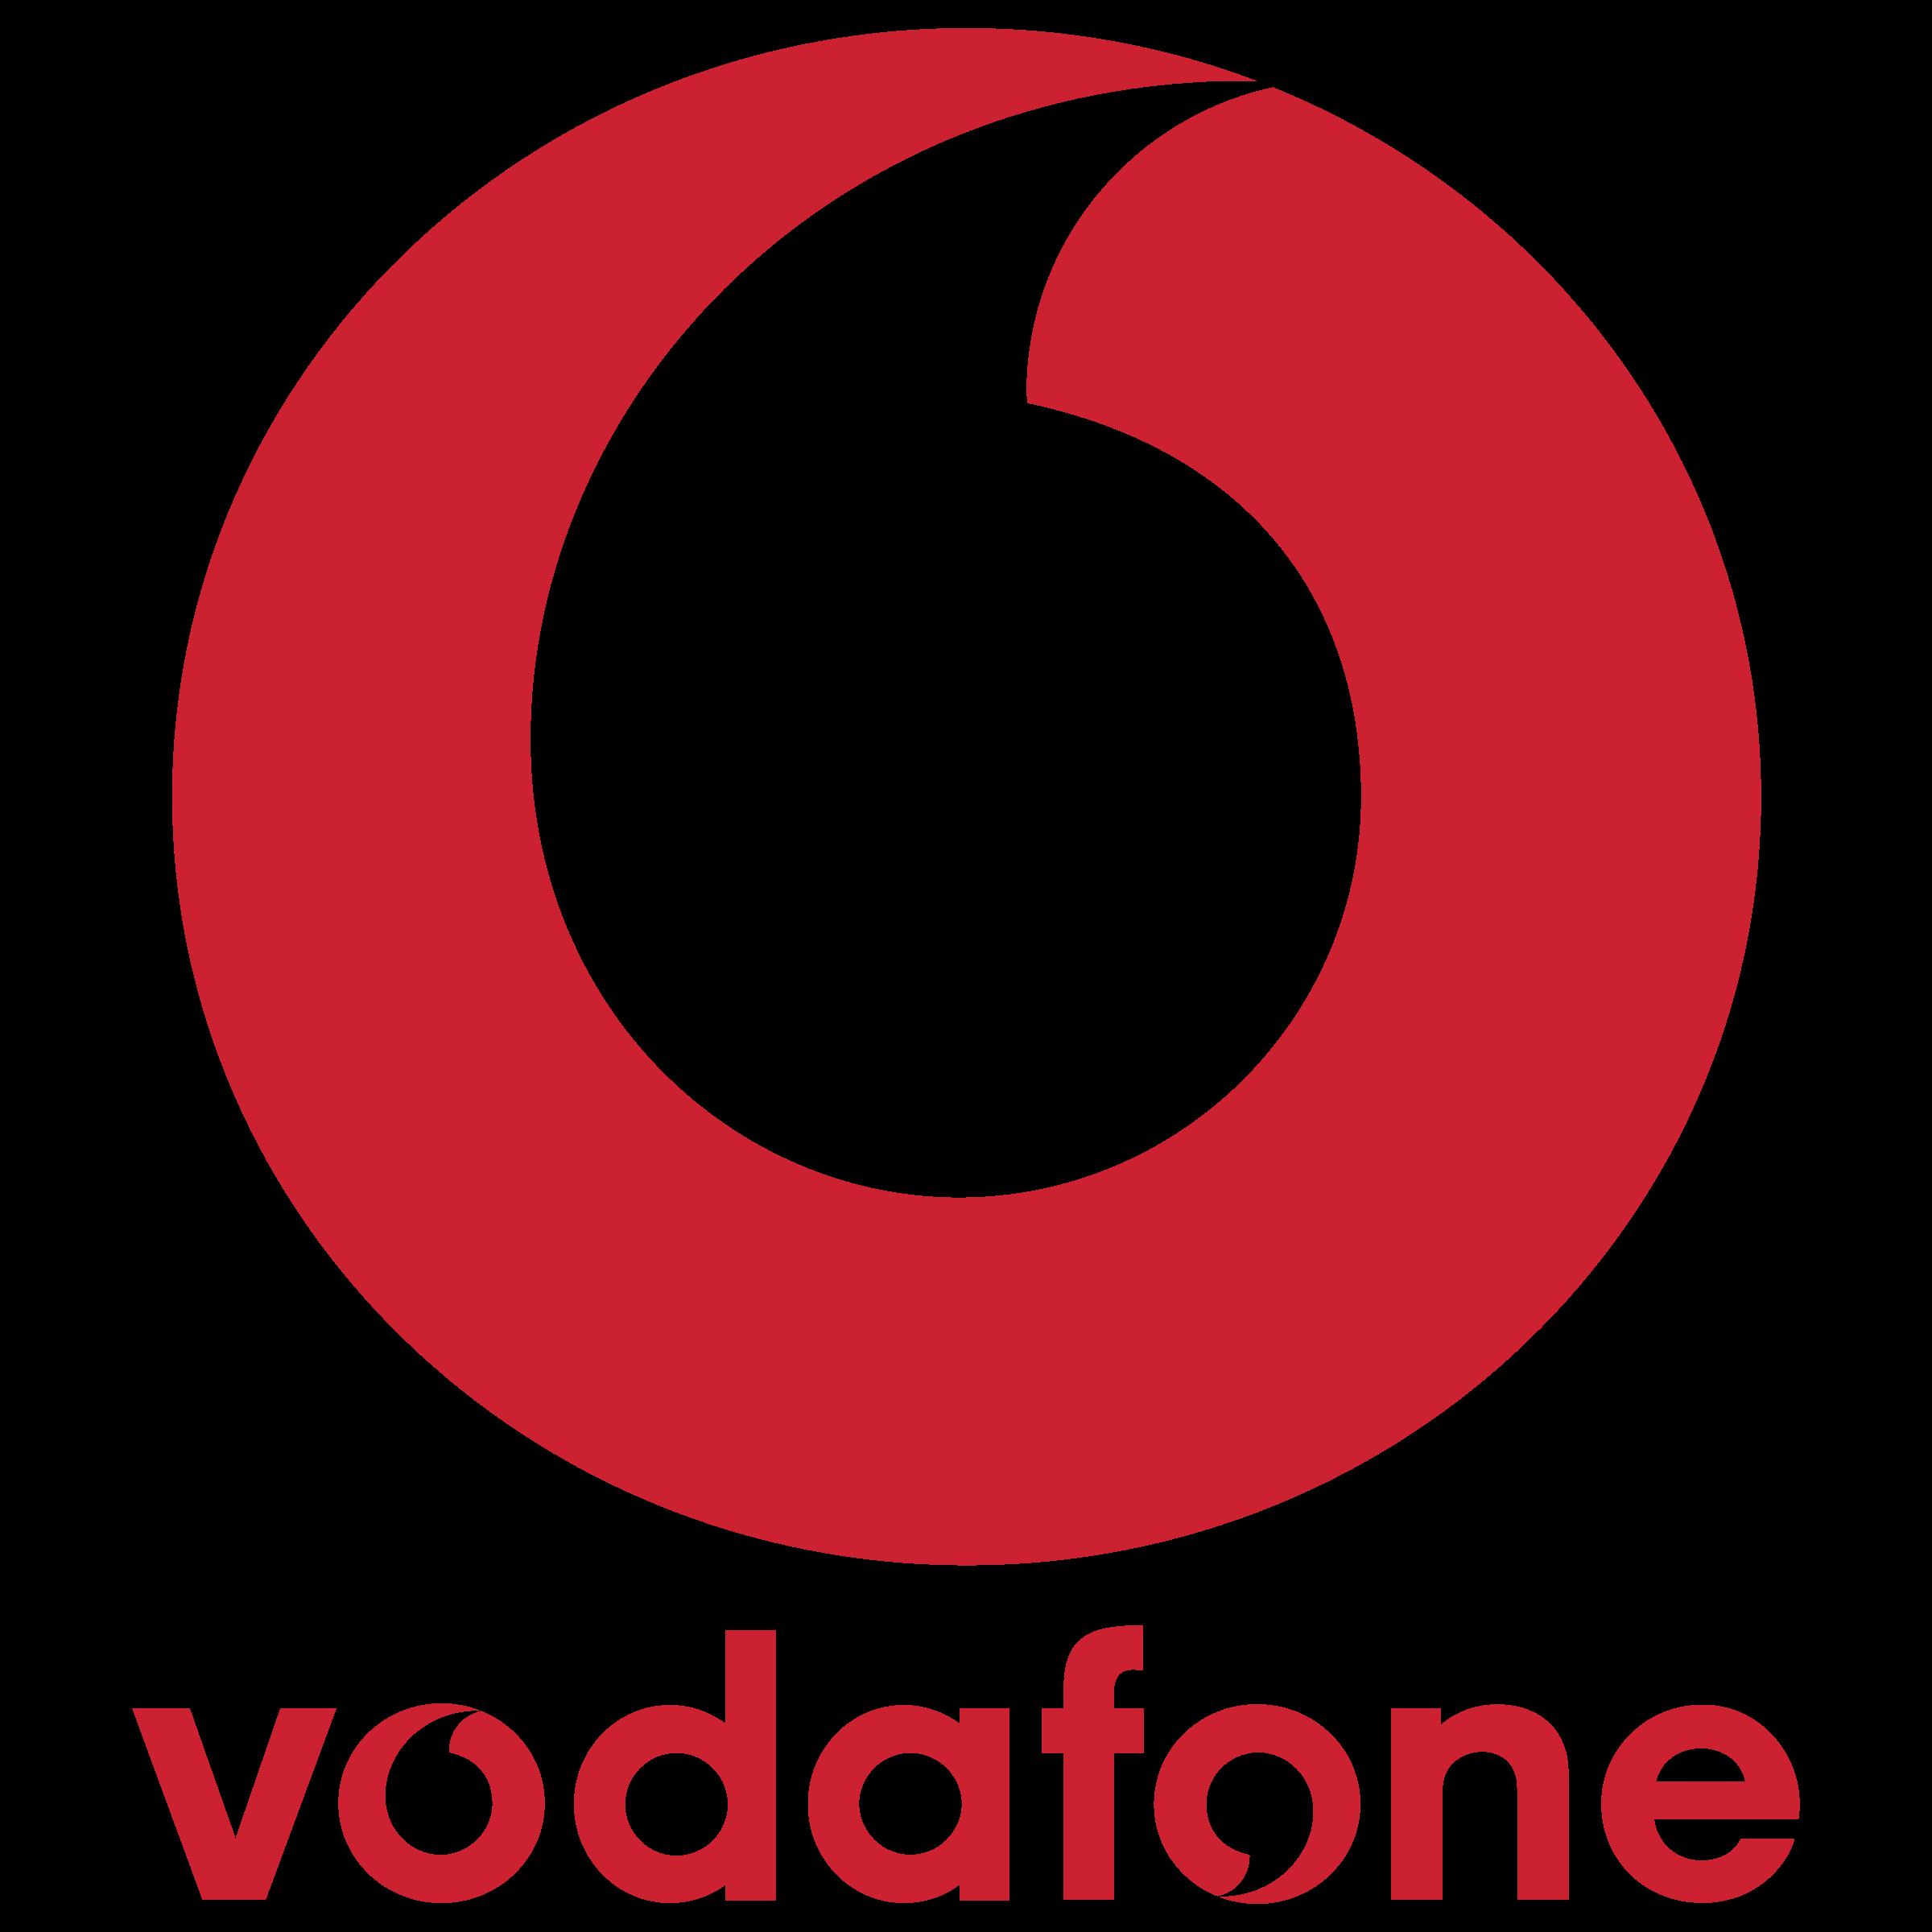 vodaphone-logo